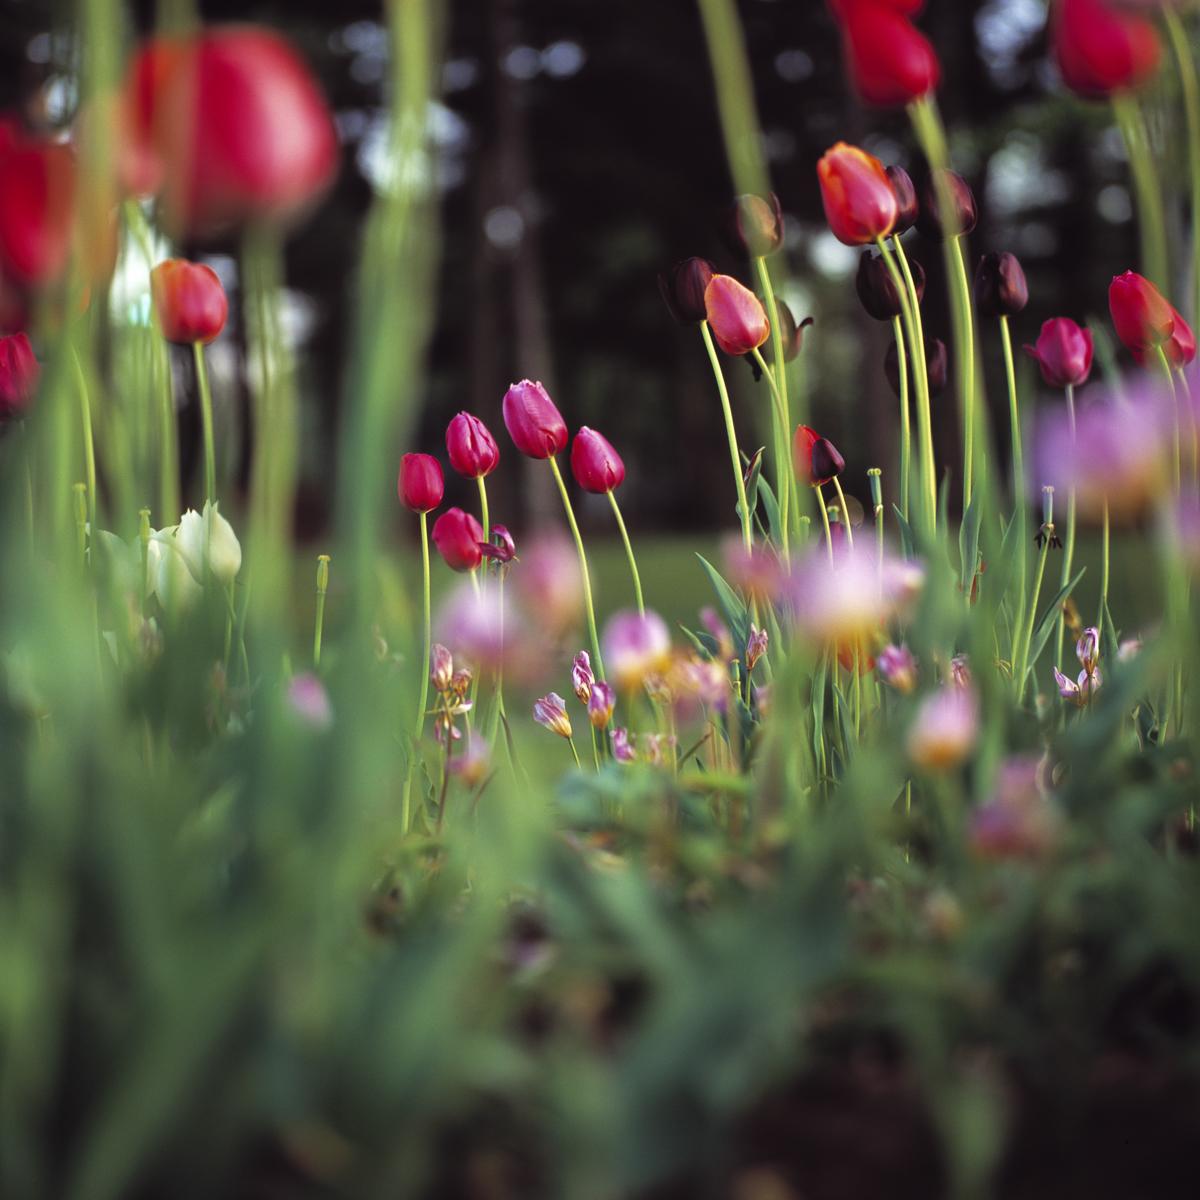 Tulips_1_15.jpg